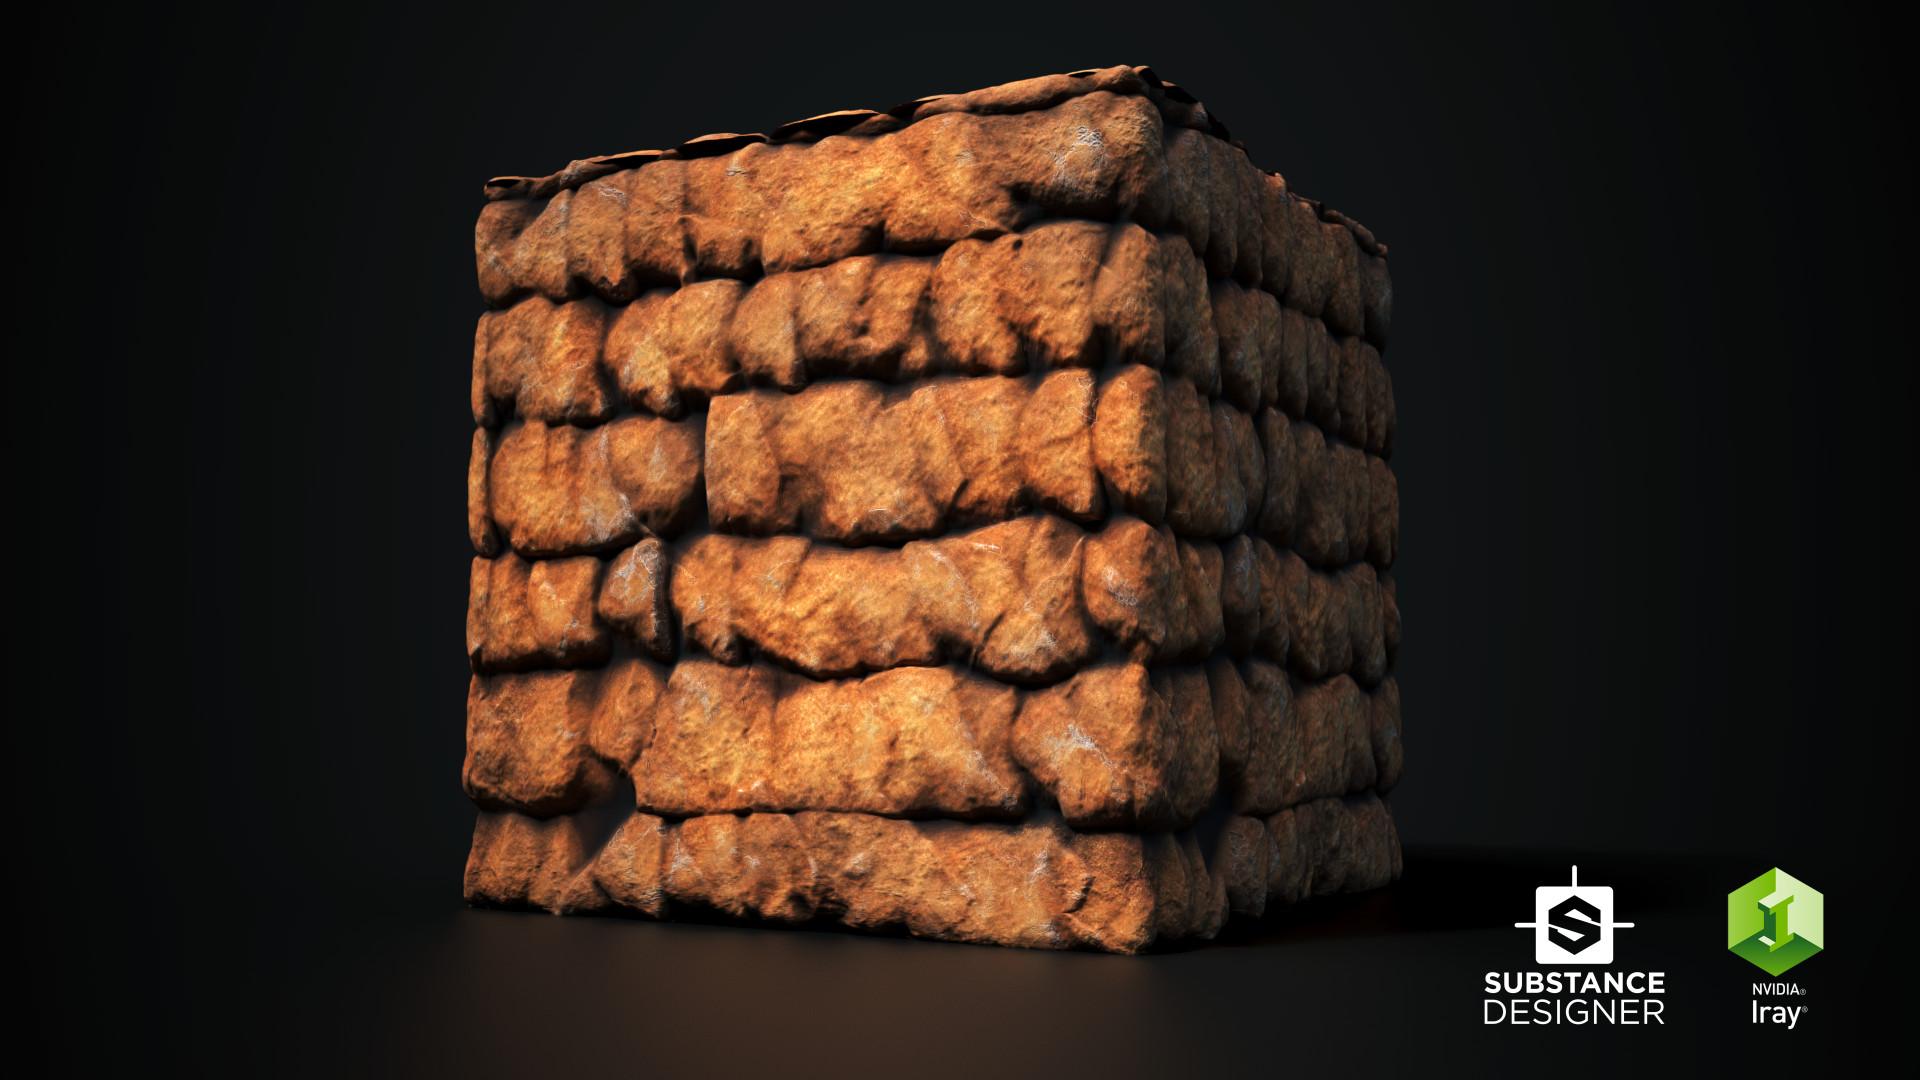 Gokhan galex ilhan rockcliff cube 01